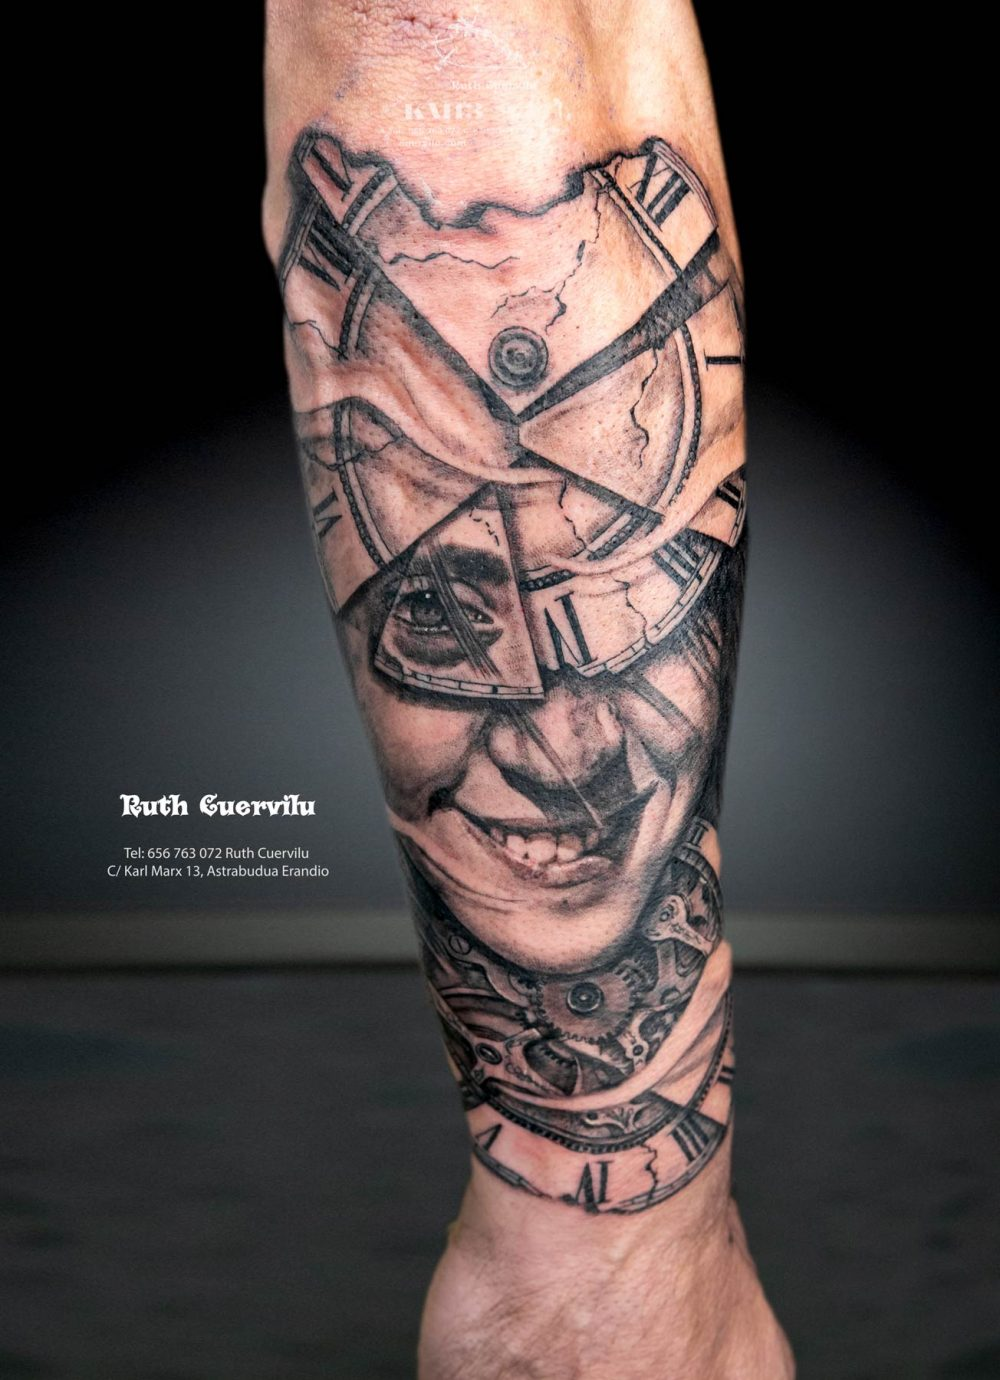 Tatuaje Retrato mujer con Relojes sin hora - Ruth Cuervilu Tattoo - KM13 Studio - Estudio de tatuajes en Astrabudua Erandio Getxo, Bilbao Bizkaia